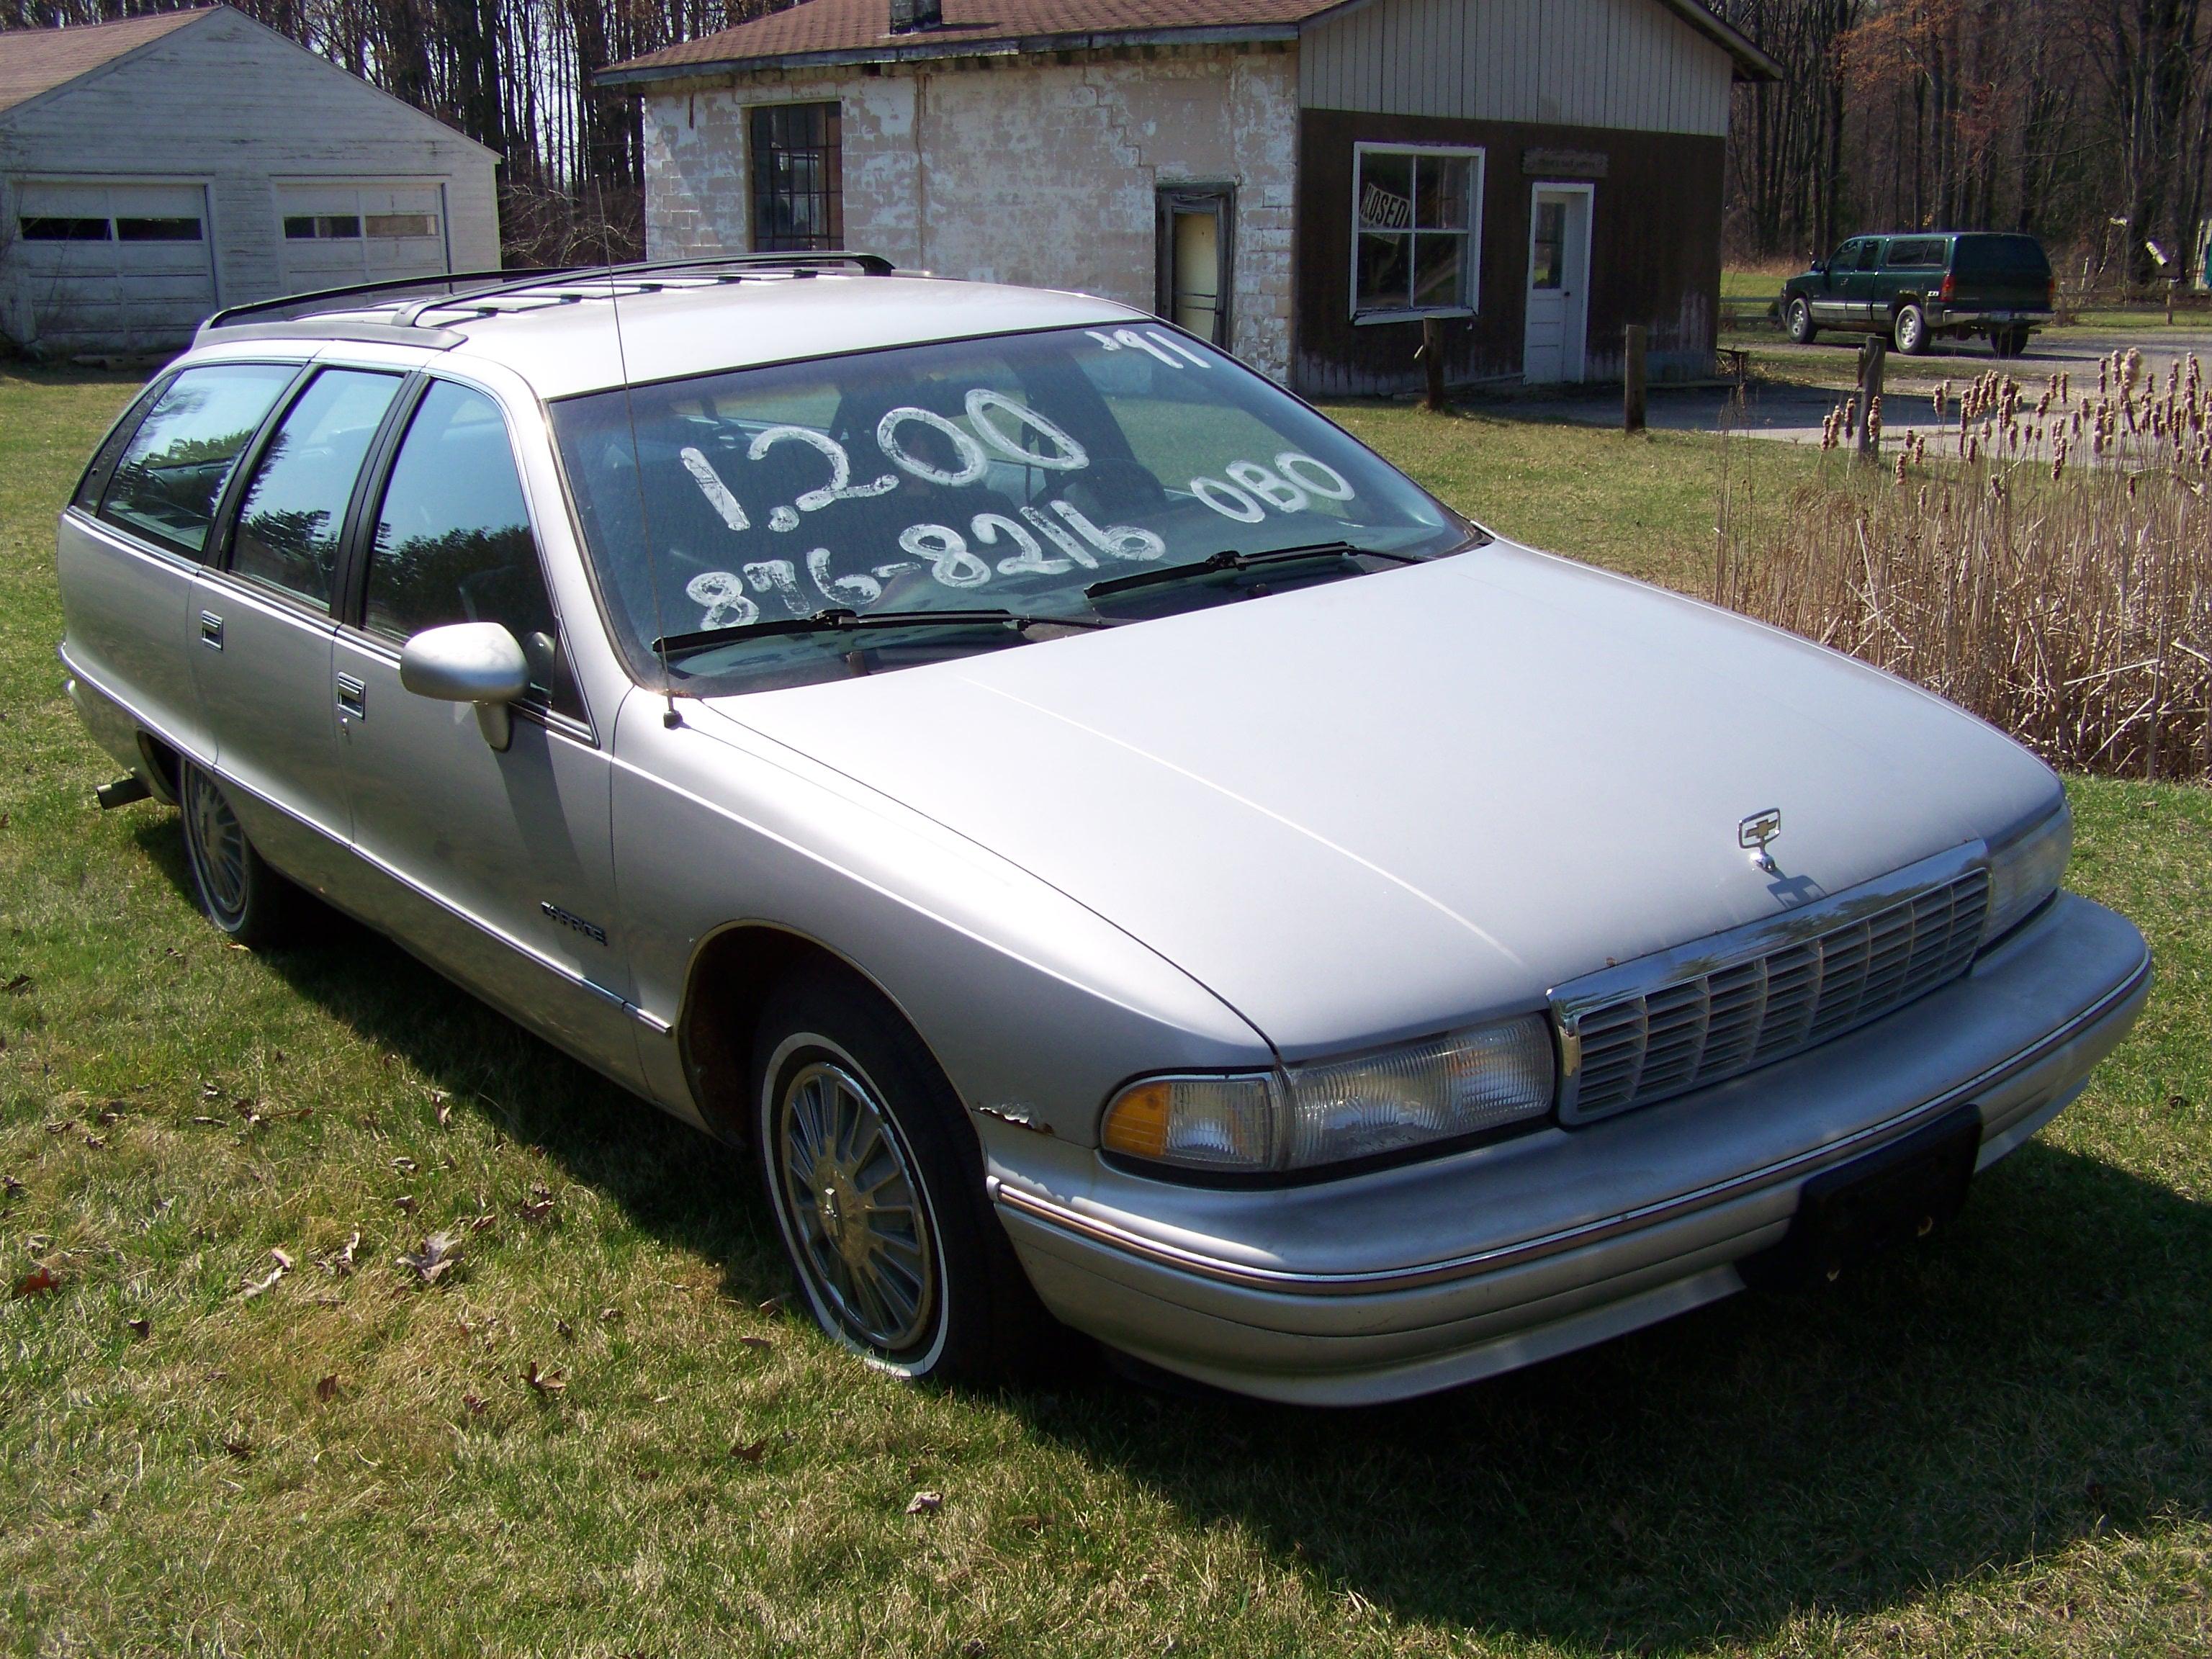 CC Capsule: 1991 Chevrolet Caprice Wagon – It's Totally